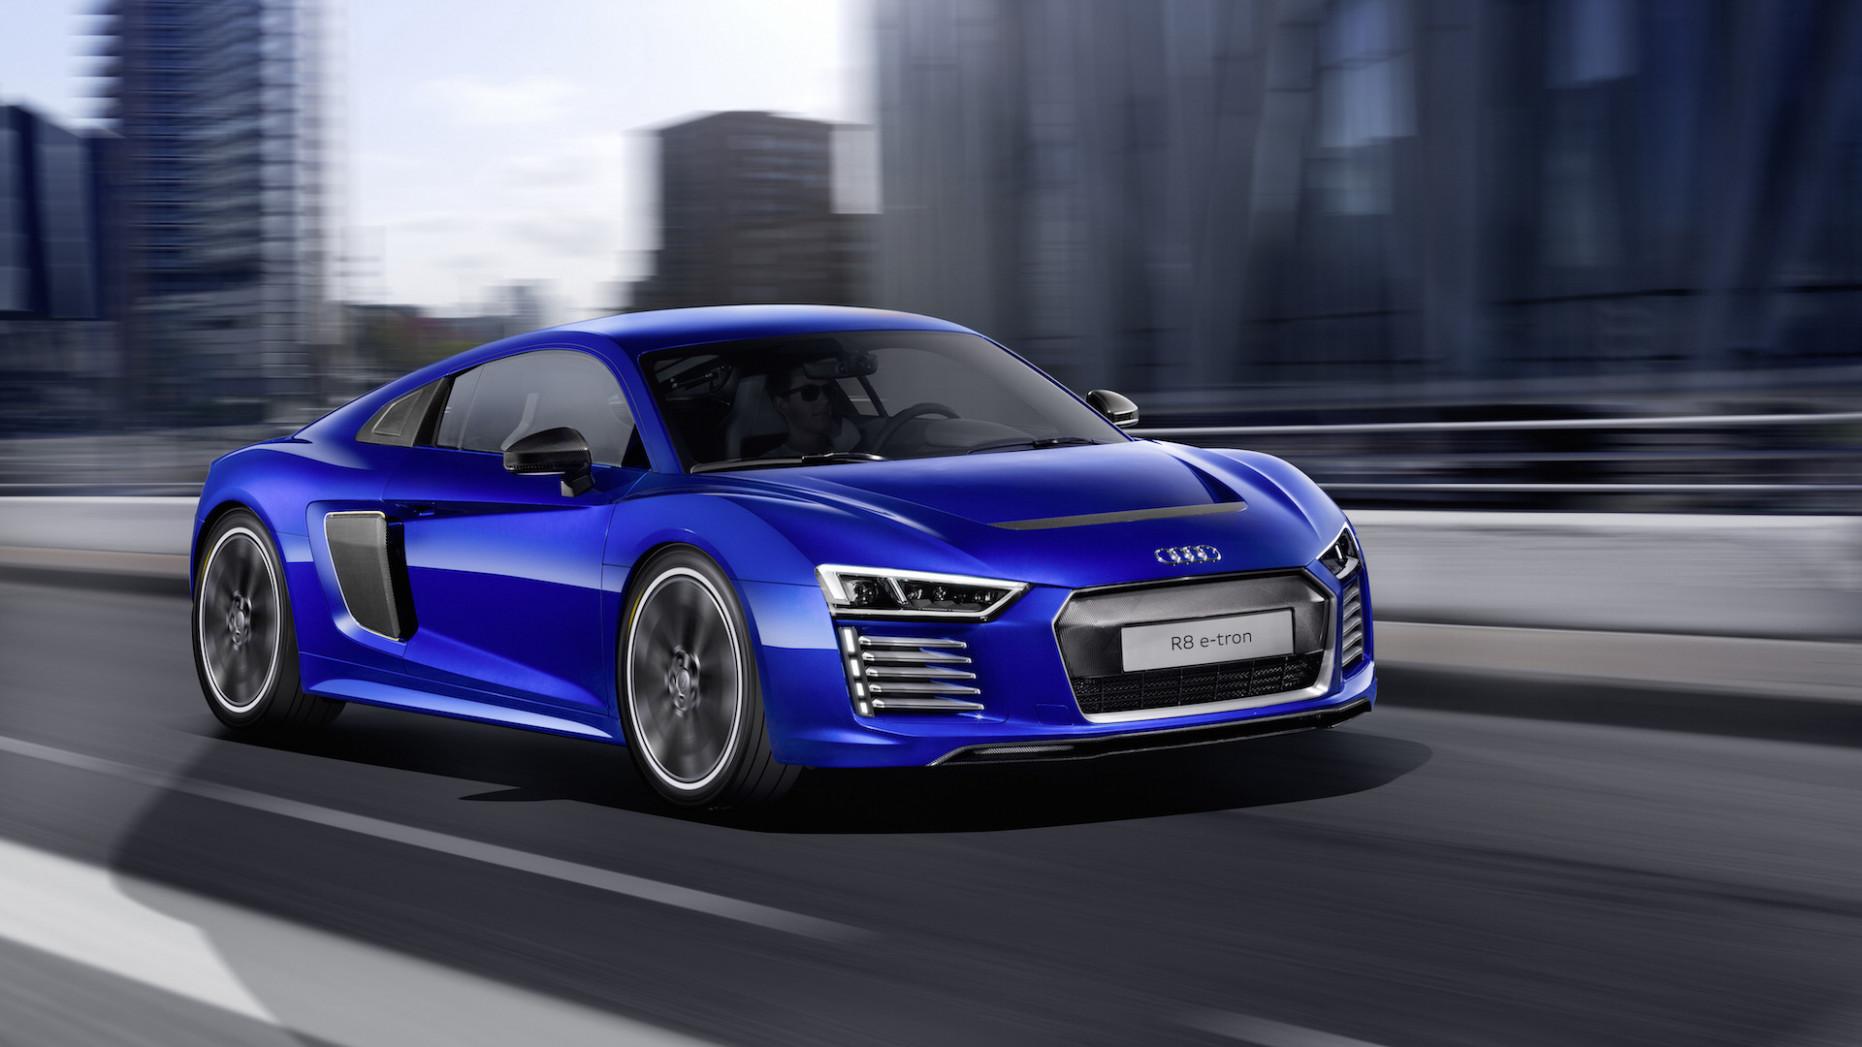 Spesification 2022 Audi R8 LMXs